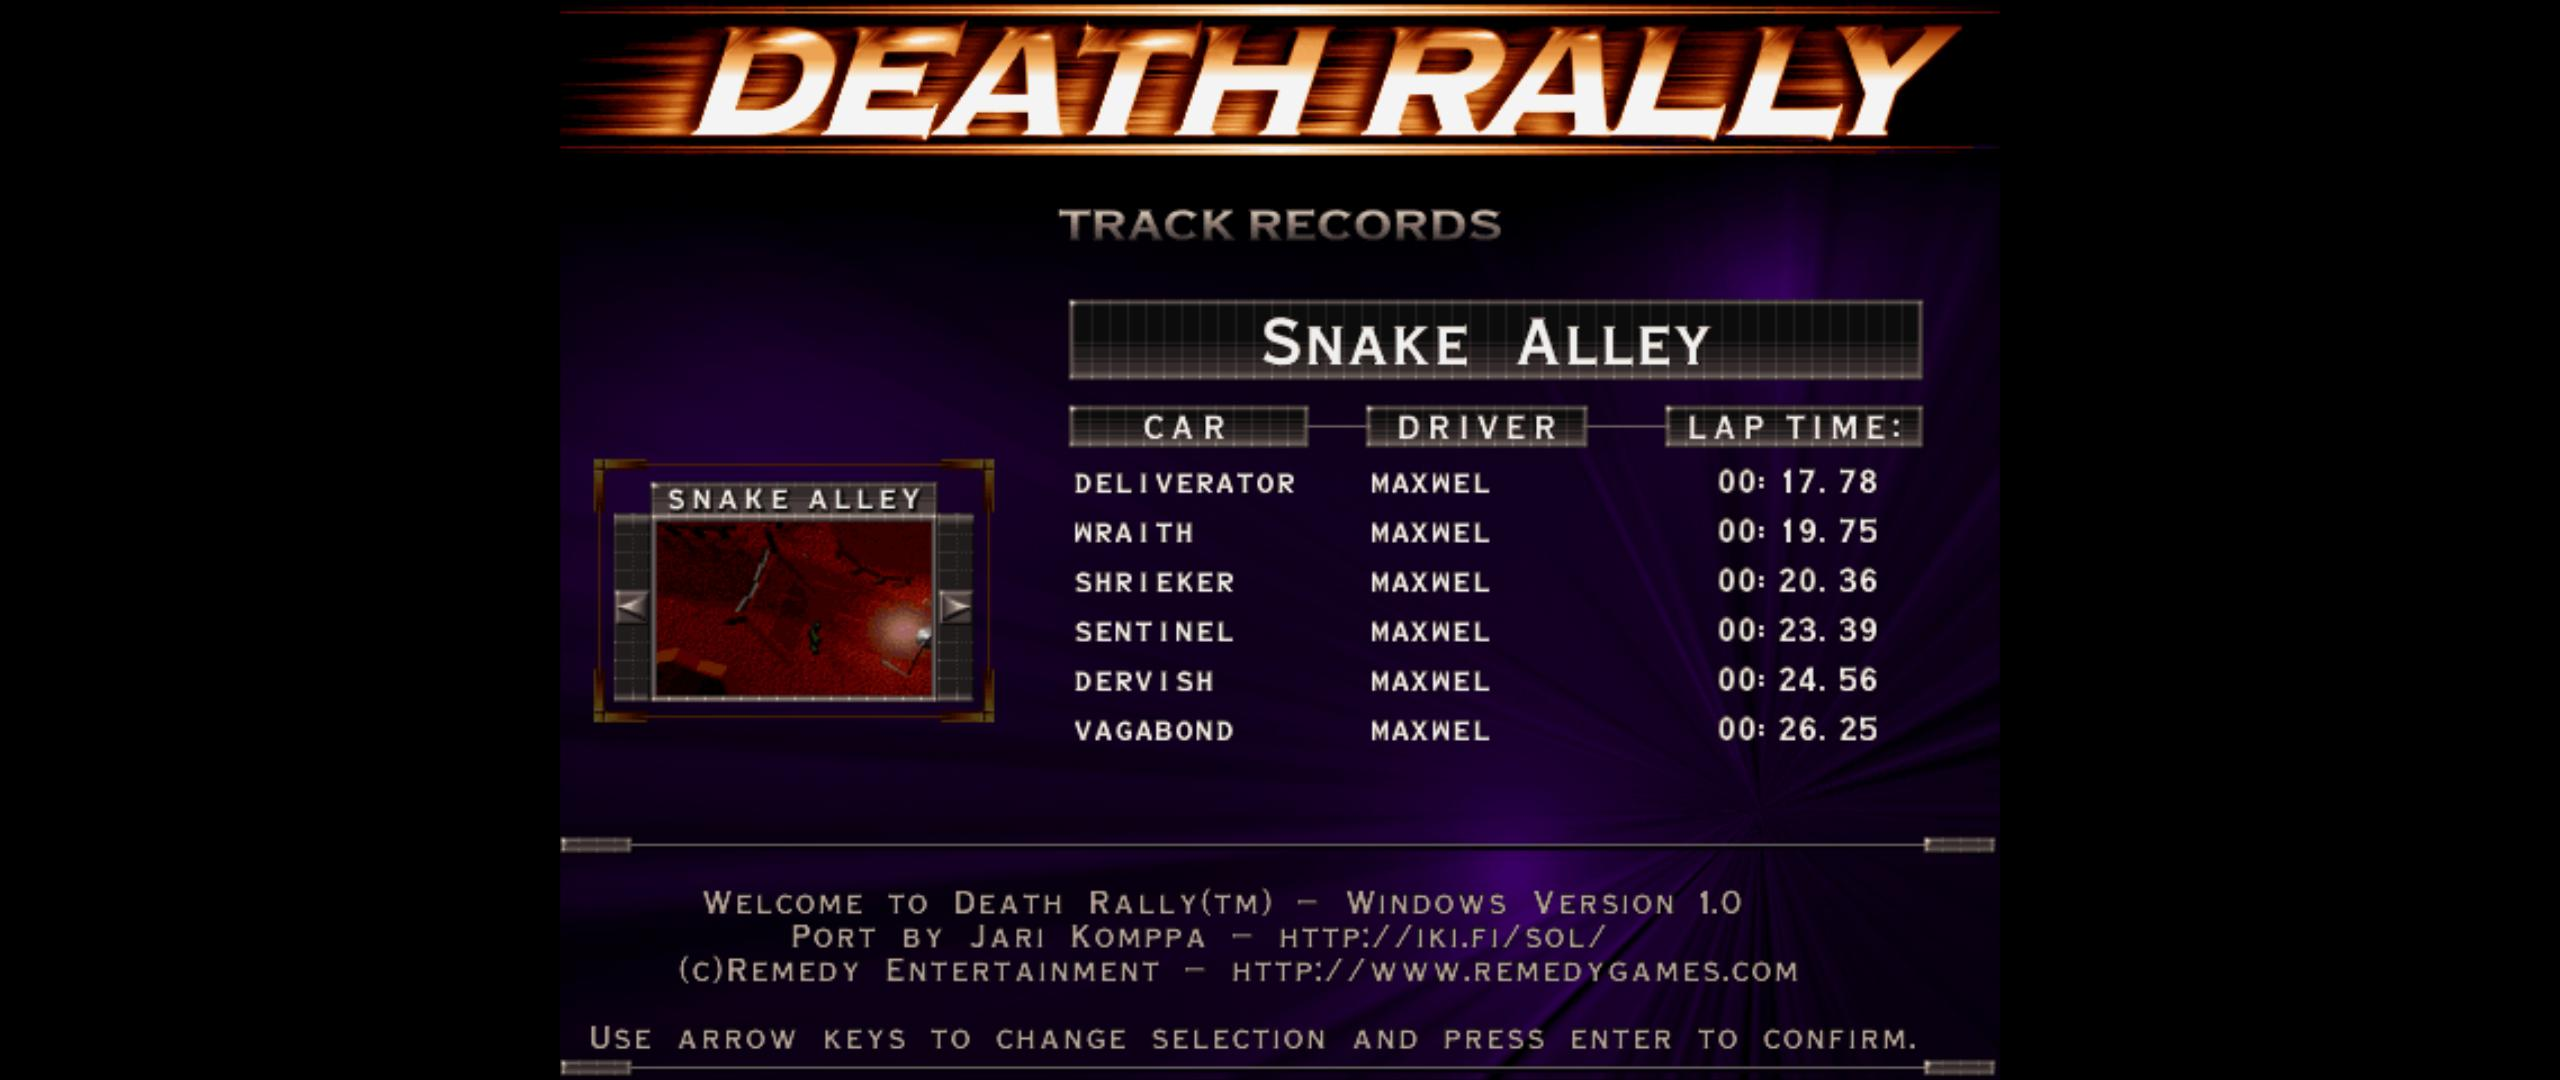 Maxwel: Death Rally [Snake Alley, Wraith Car] (PC) 0:00:19.75 points on 2016-03-03 03:05:51